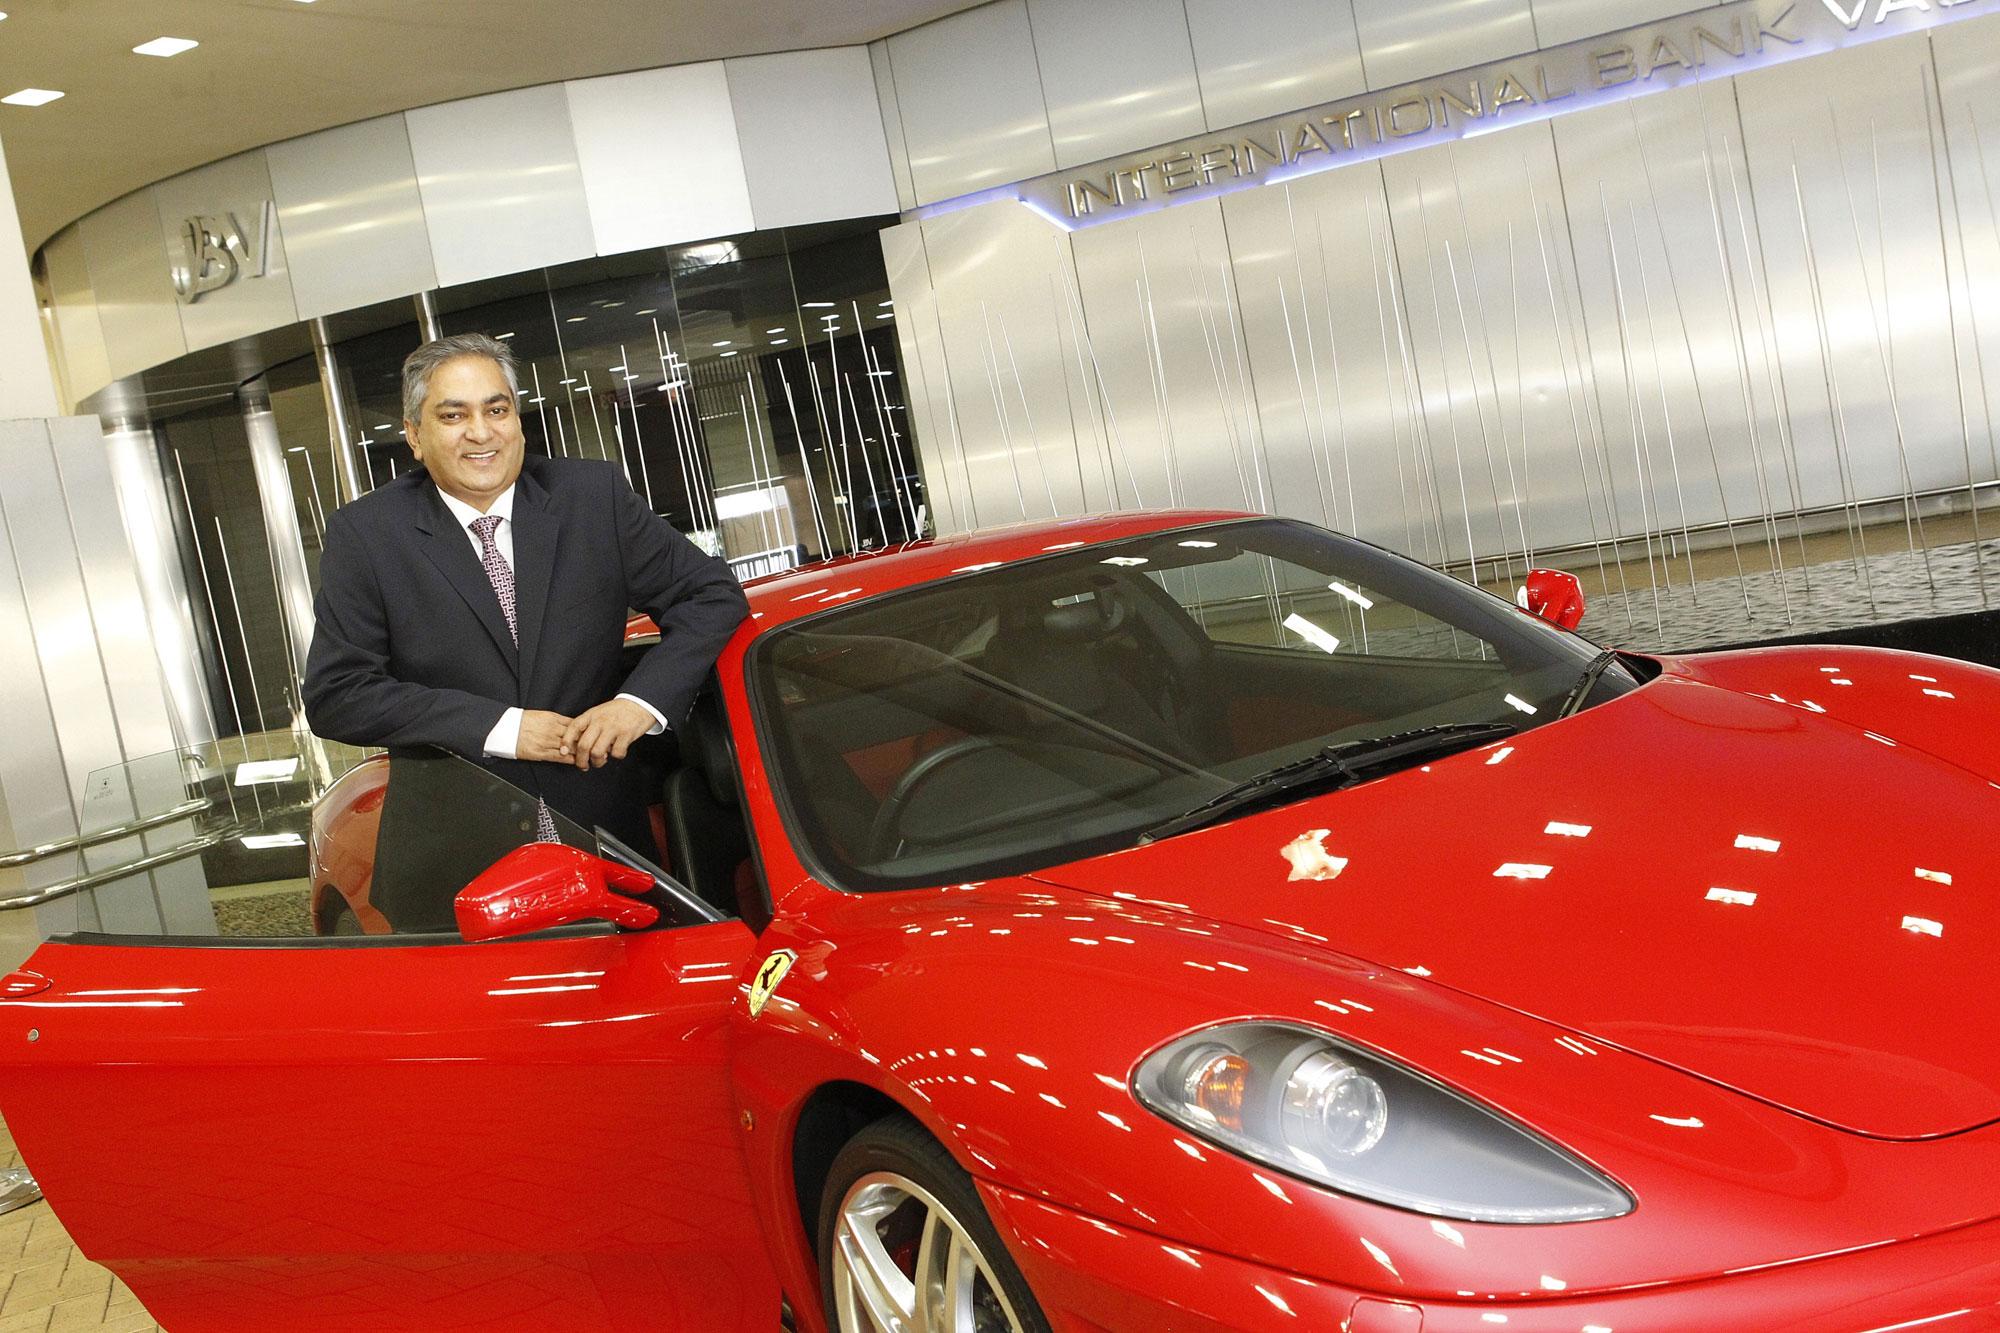 Ashok Sewnarain, CEO Of IBV International Vaults 8